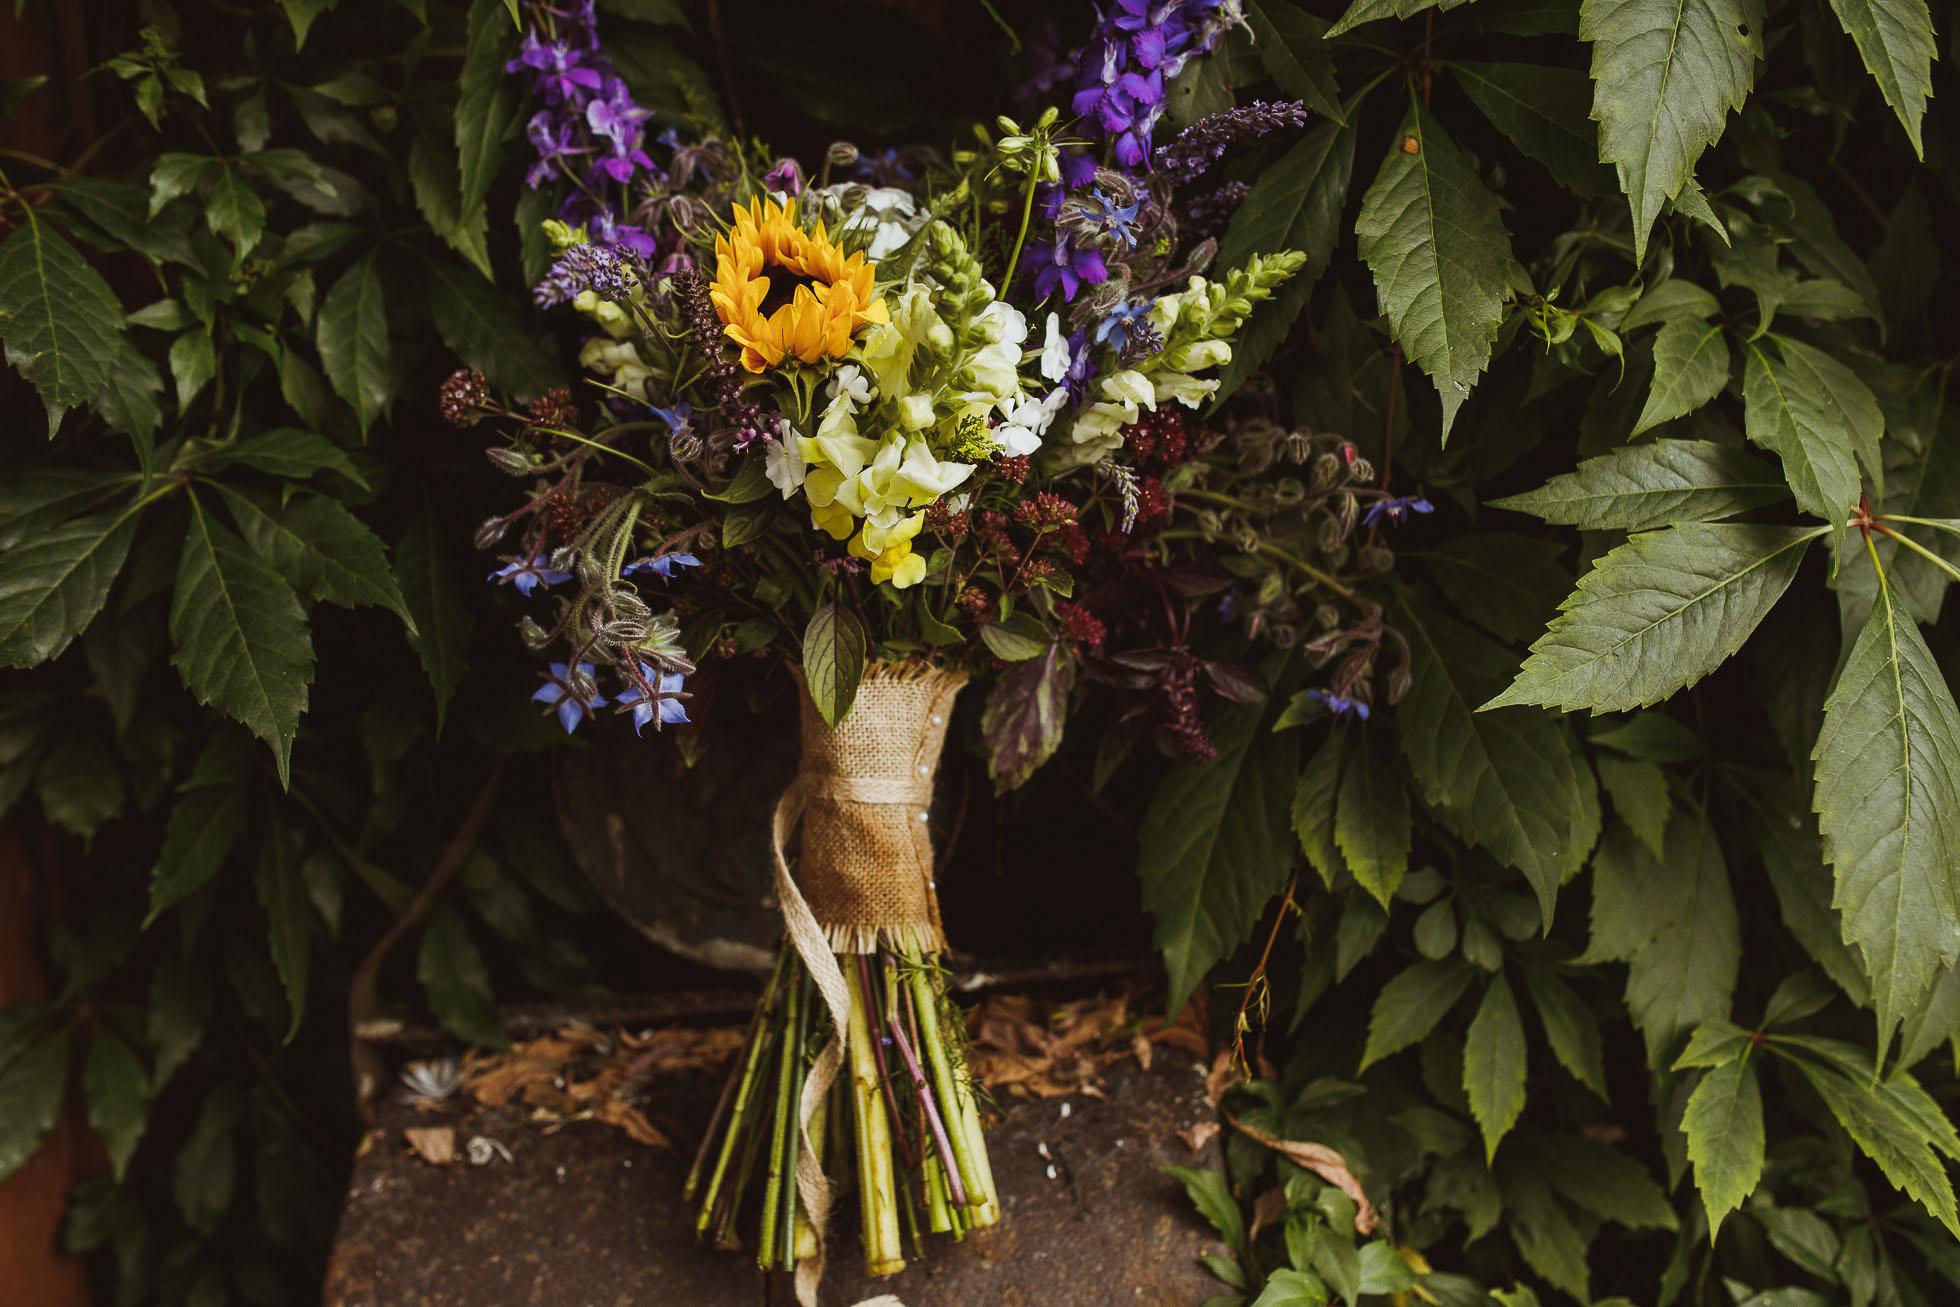 skipbridge_farm_wedding_york-19.jpg